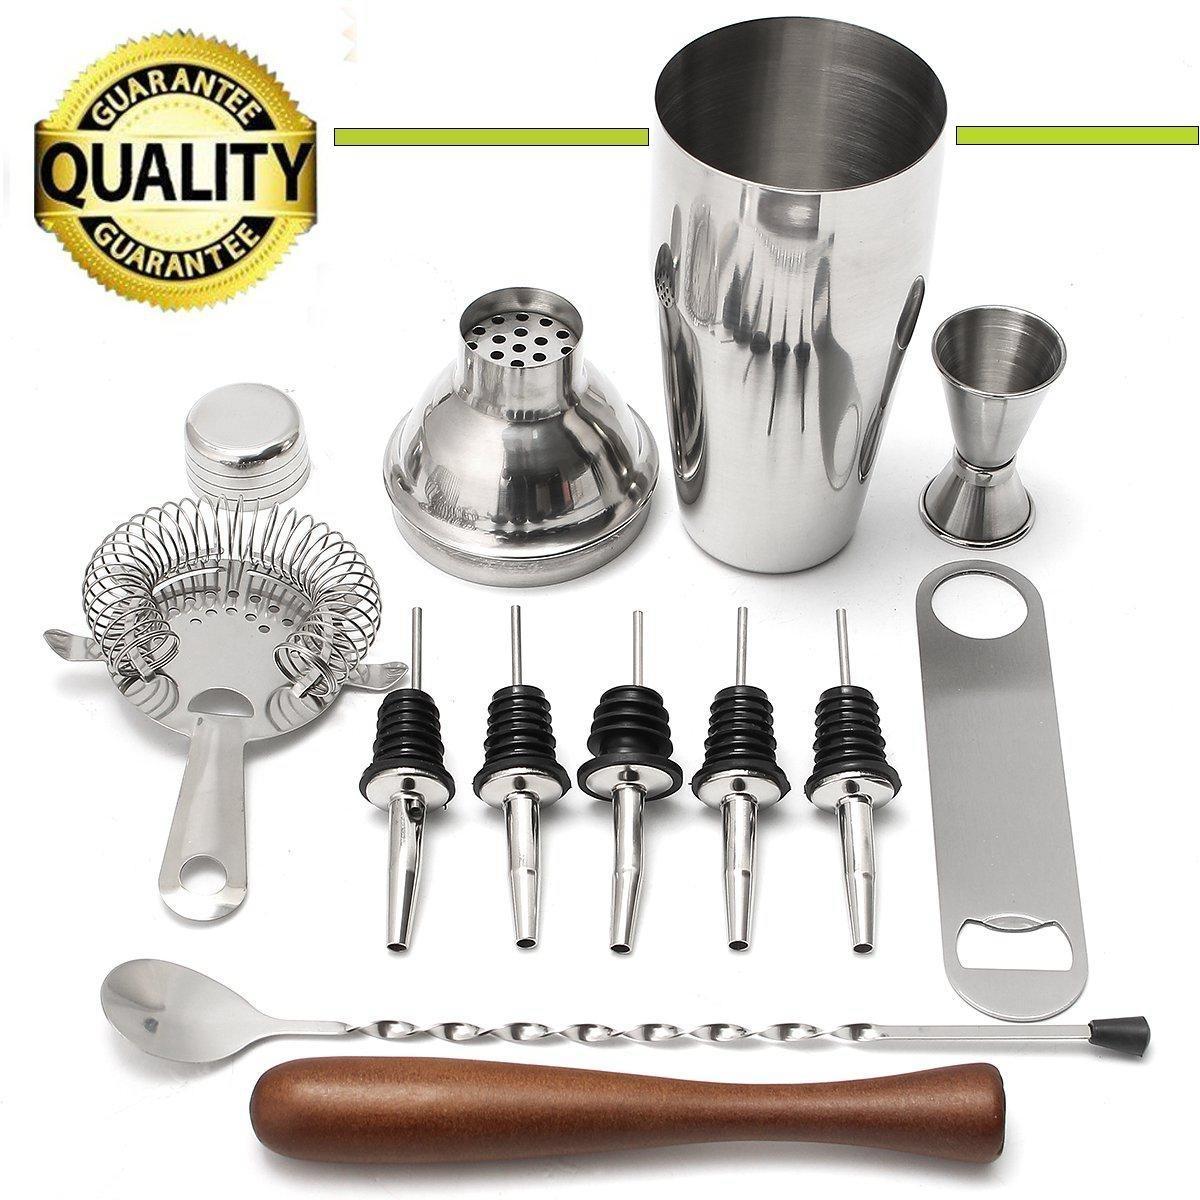 Generic 11pcs 700ml Stainless Steel Cocktail Jigger Mixer